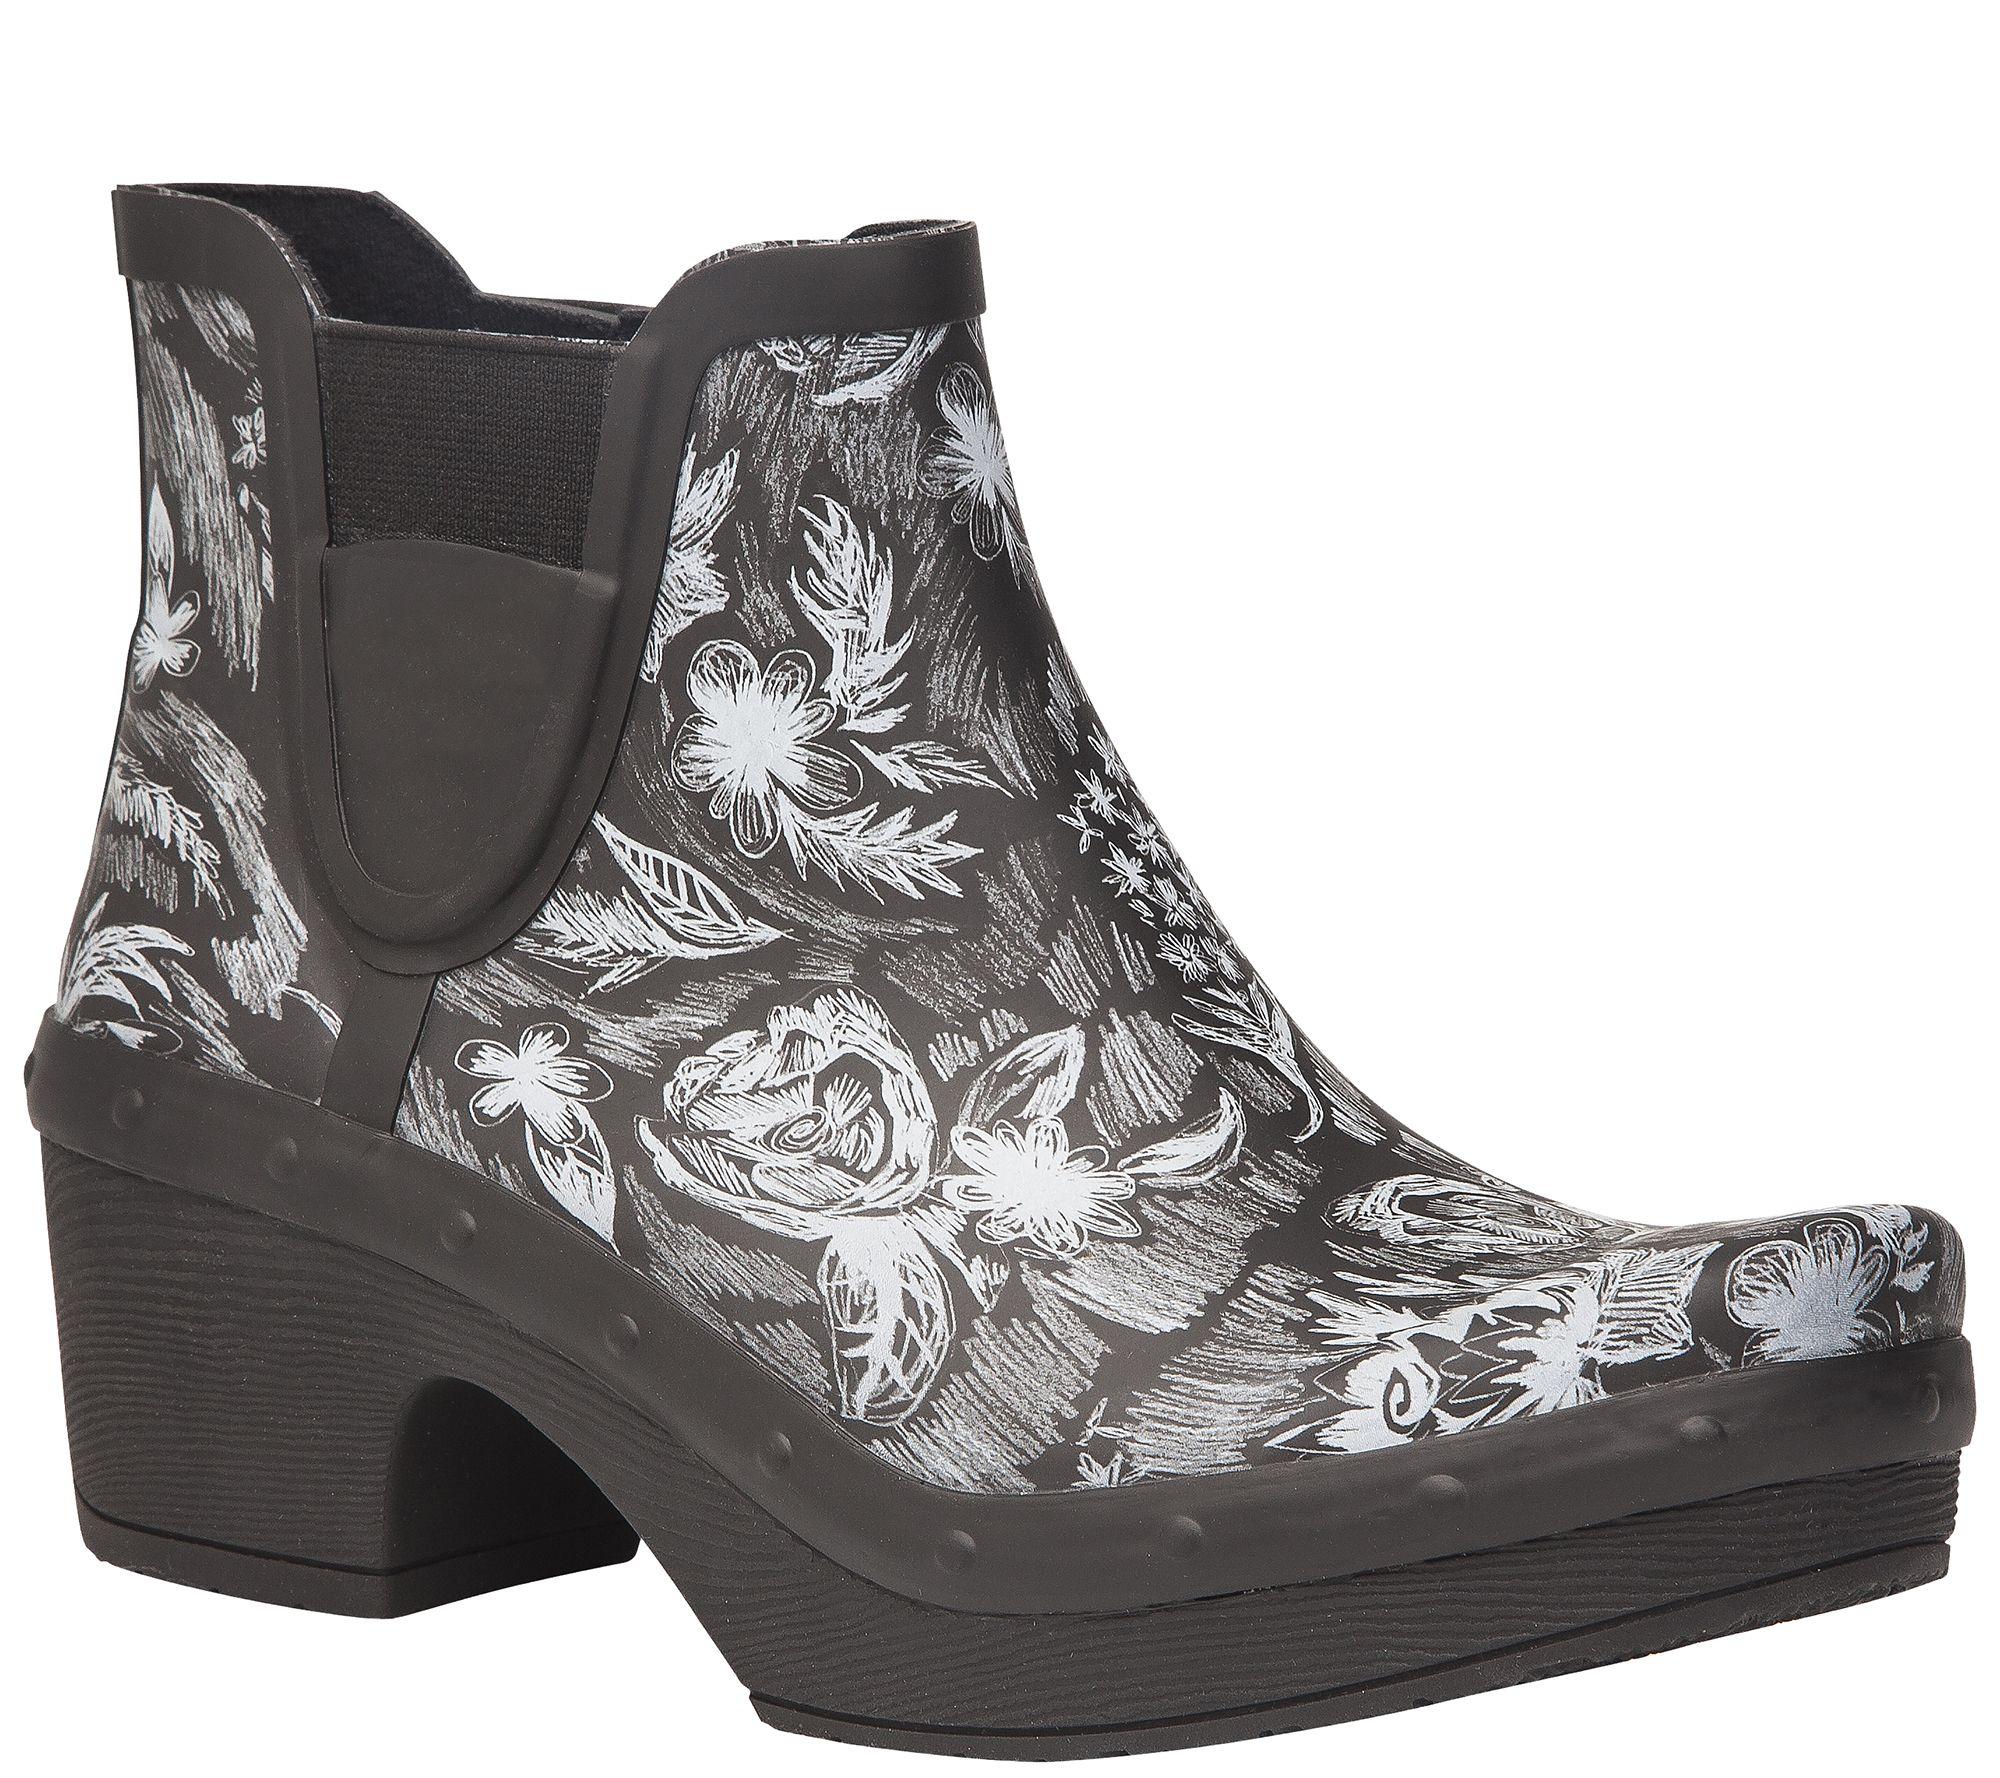 Dansko Shoes Boots